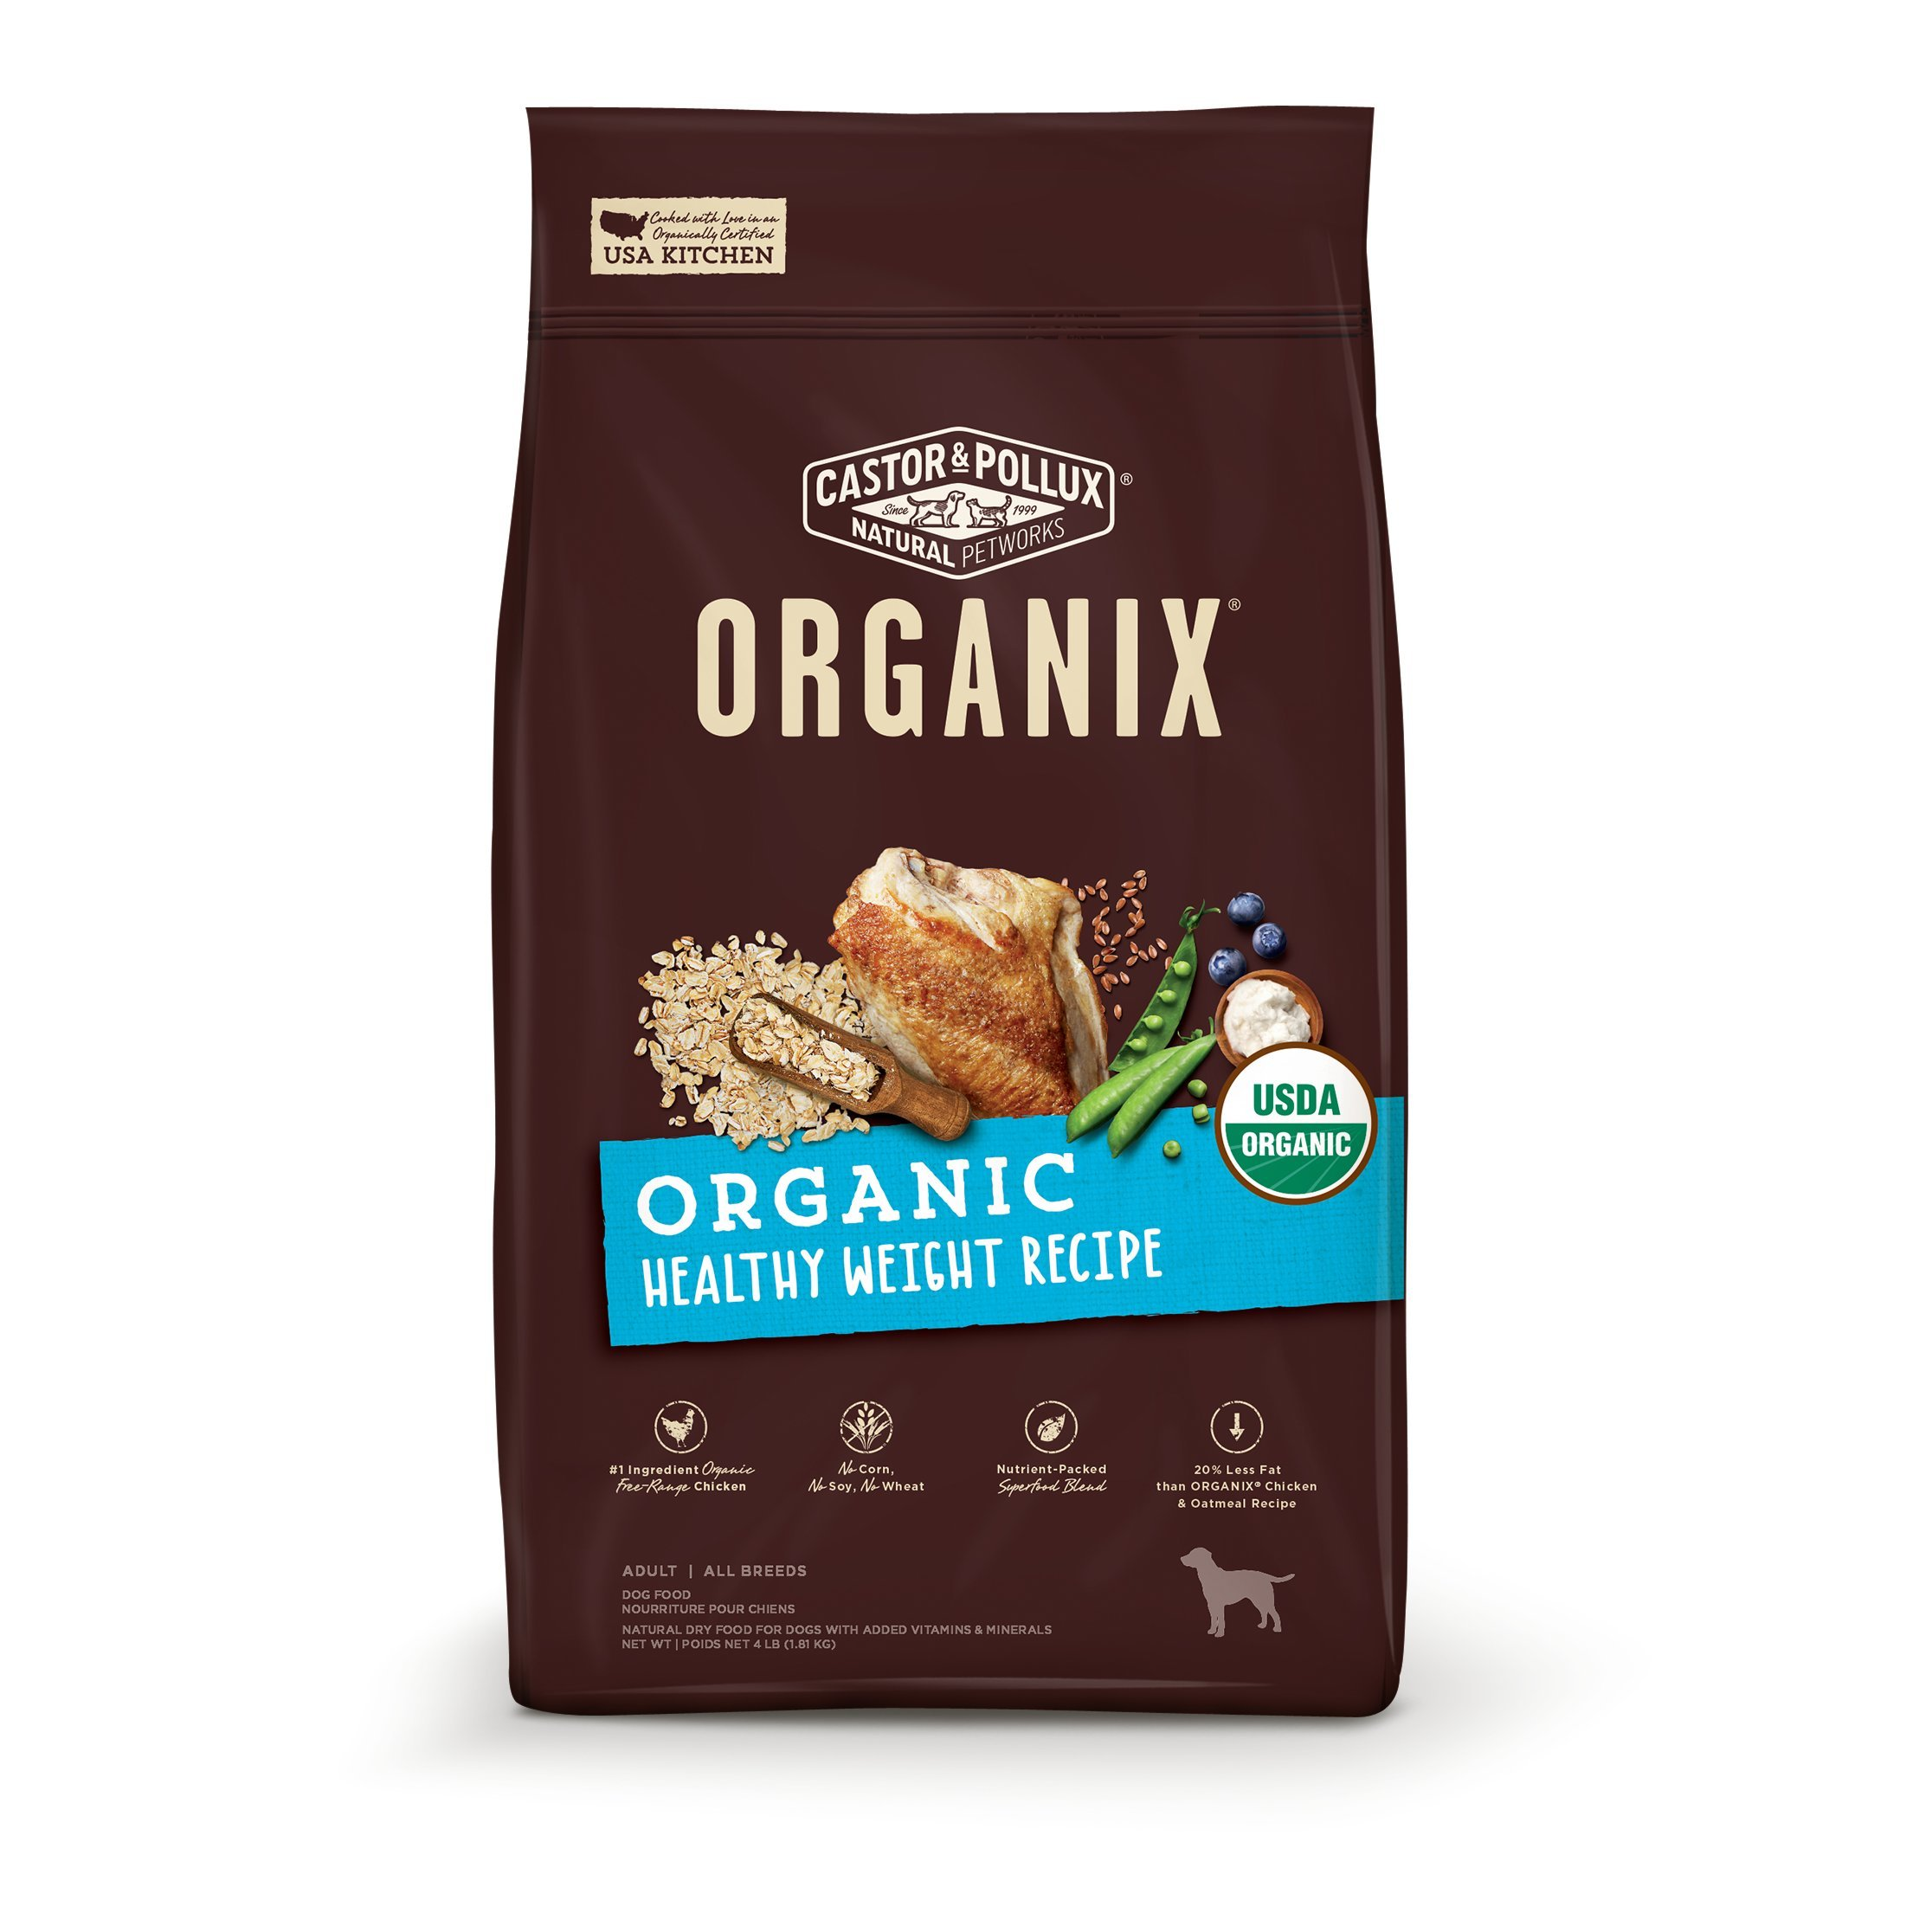 Castor & Pollux Organix Organic Healthy Weight Recipe, 10Lb by Castor & Pollux